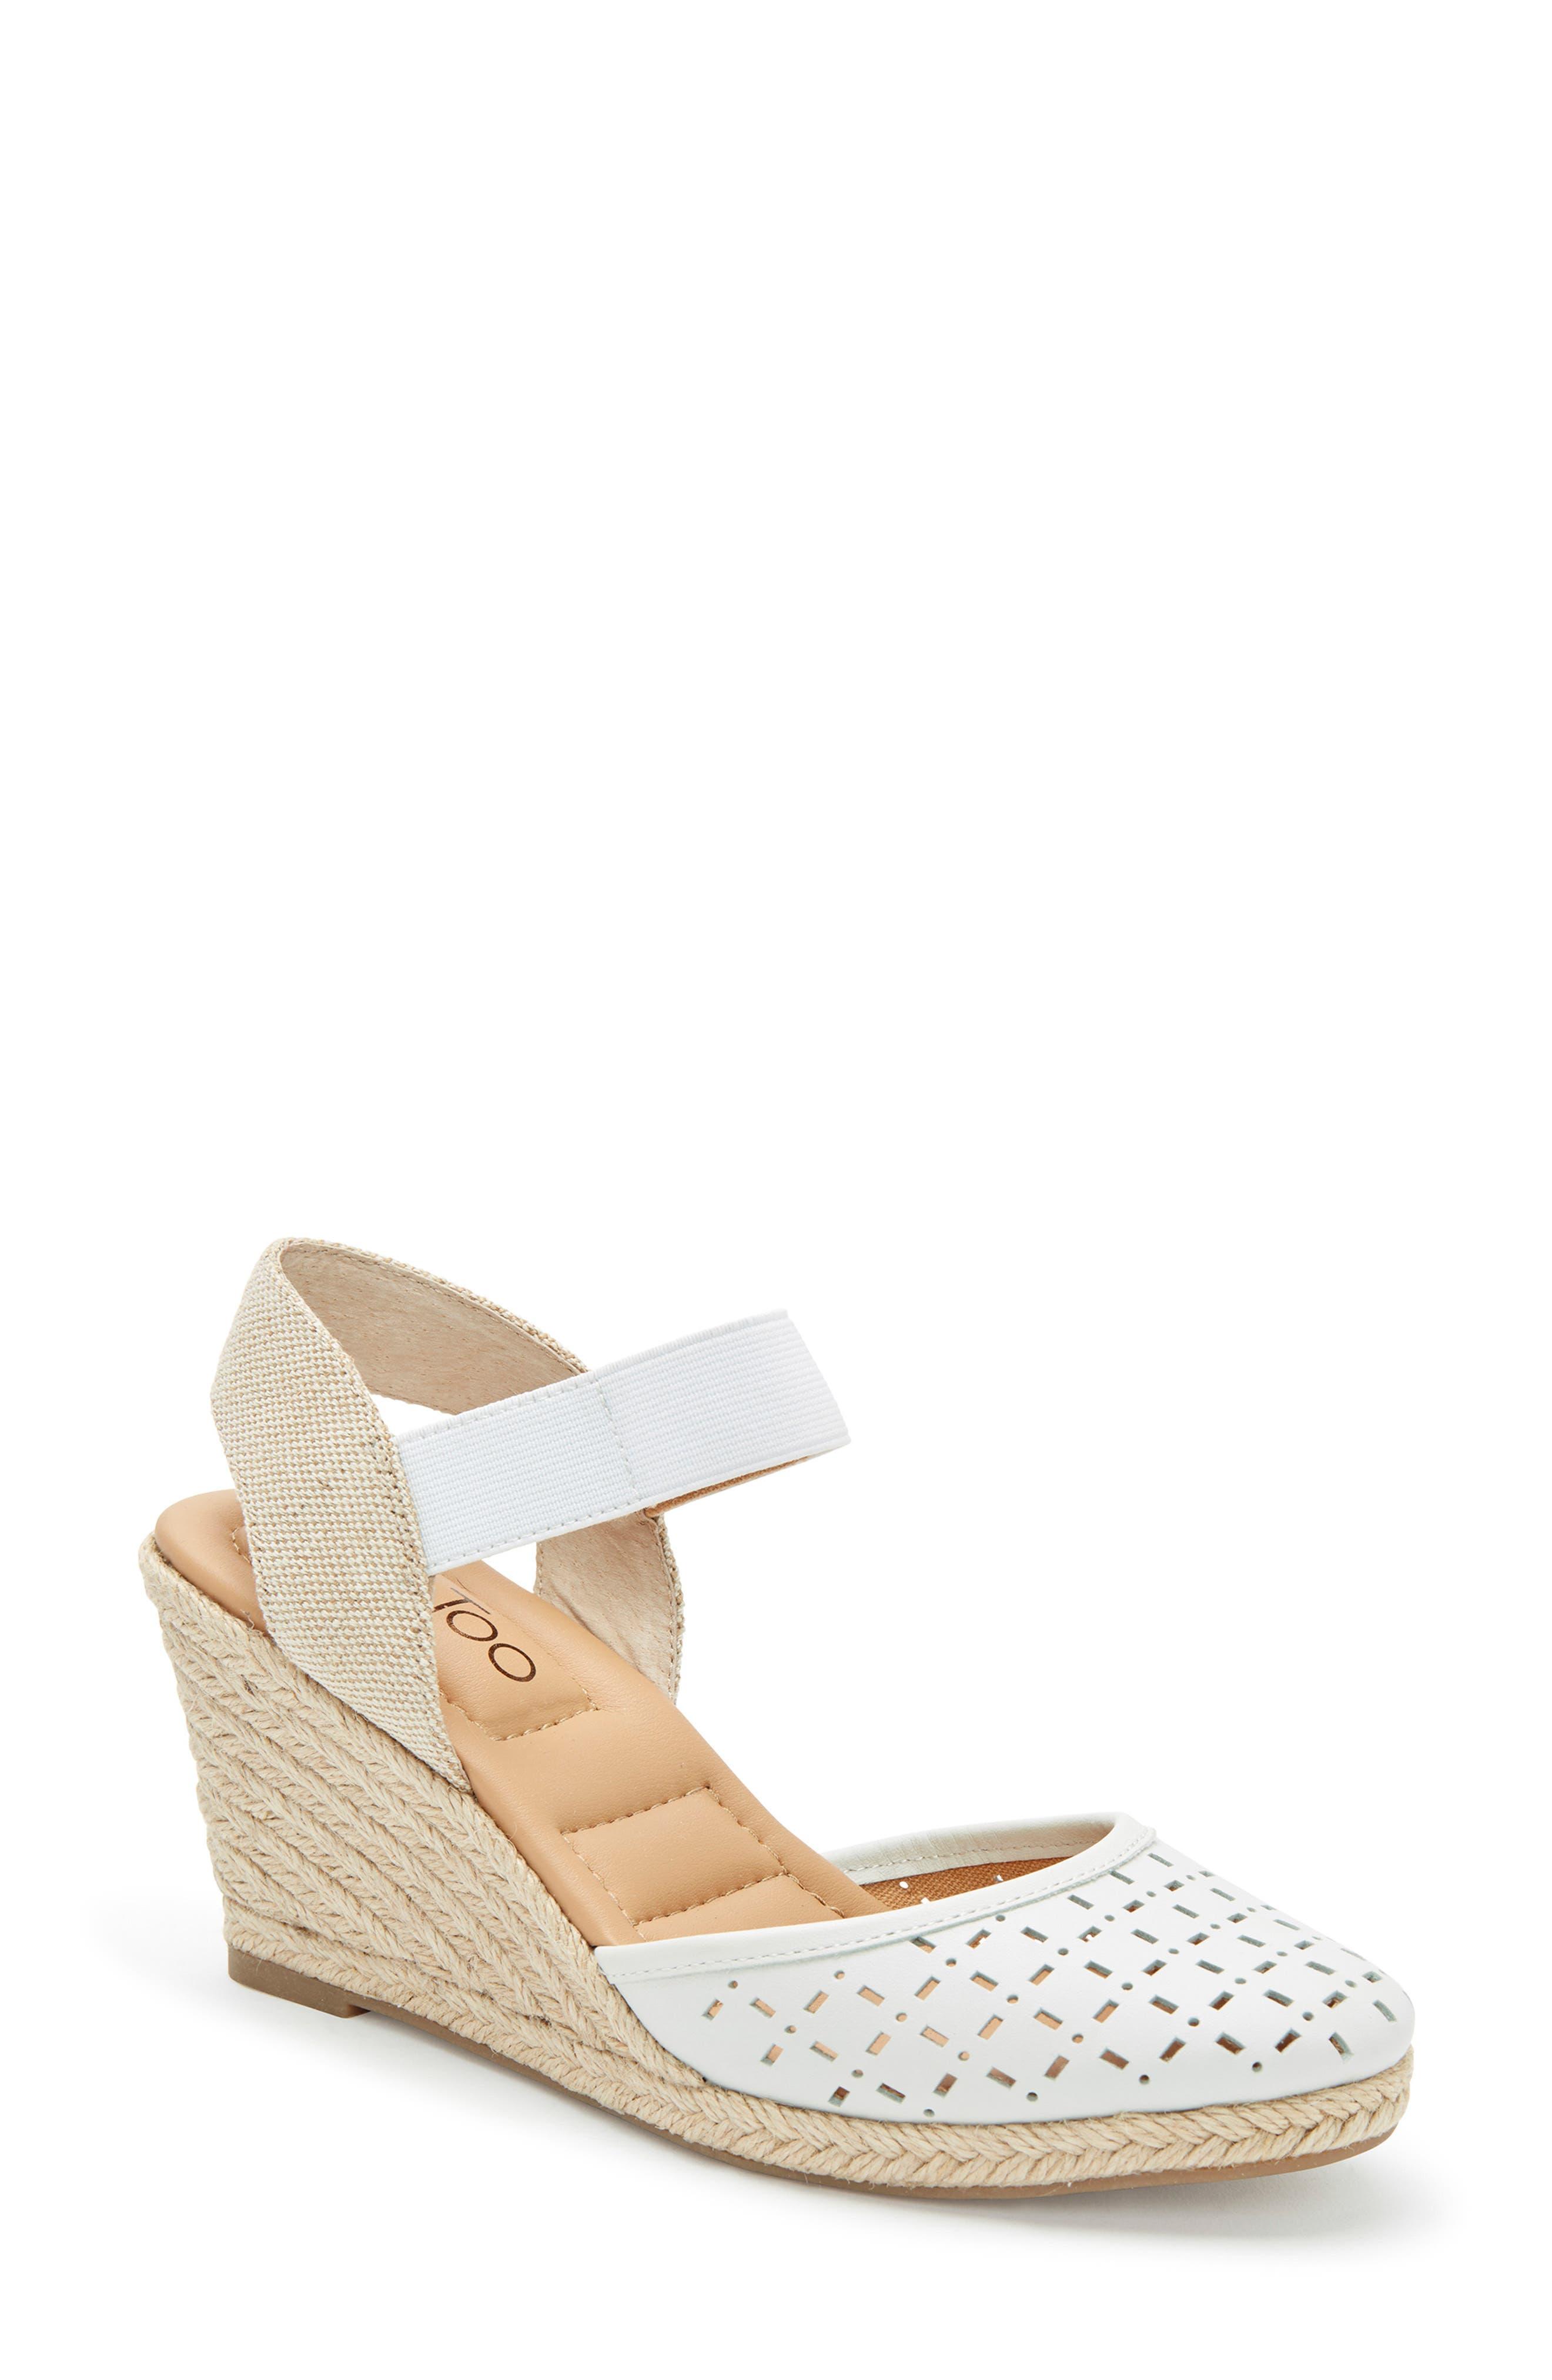 Me Too Bess Wedge Sandal, White